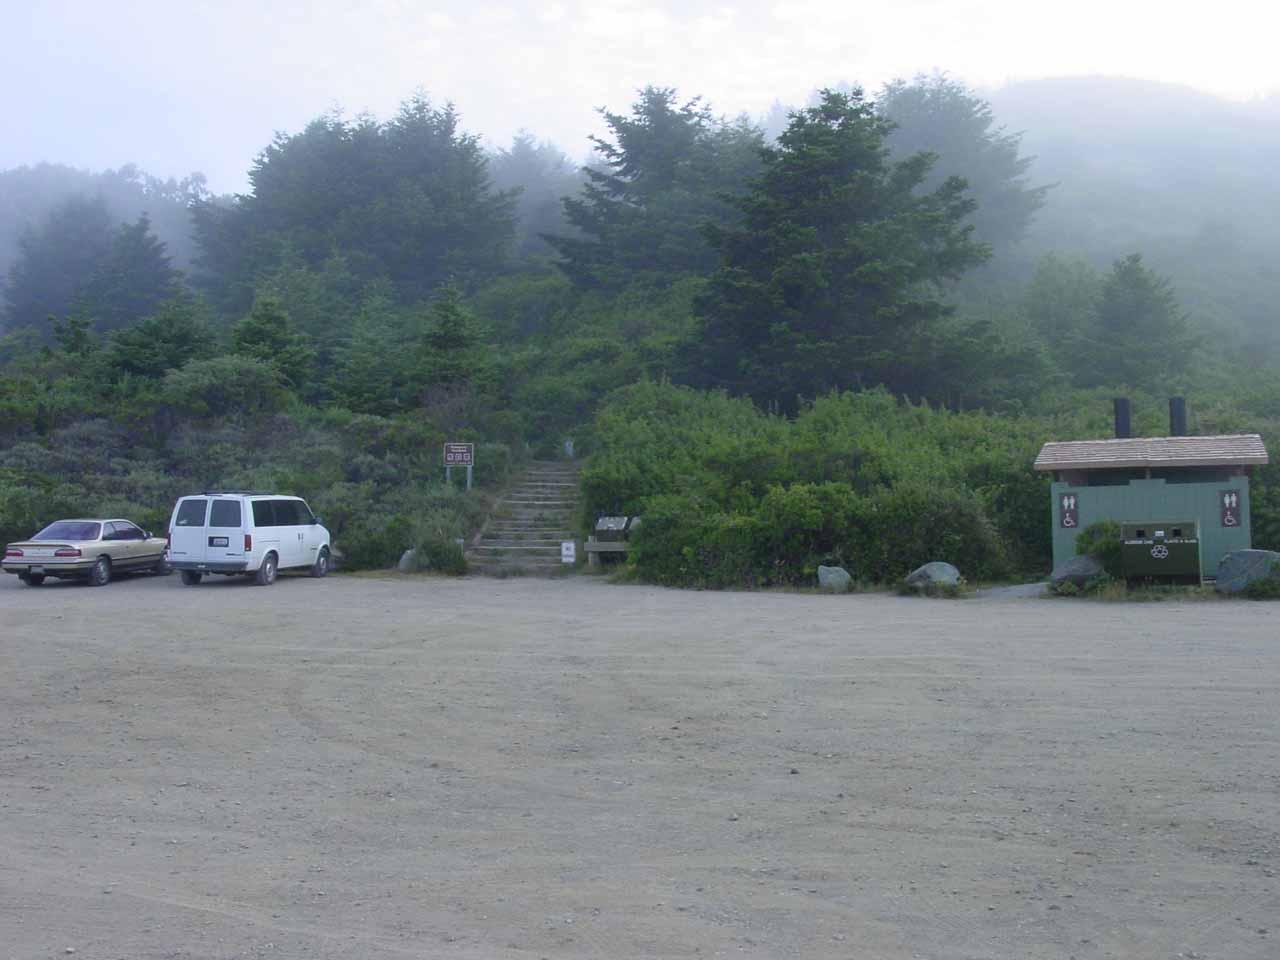 The Palomarin Trailhead